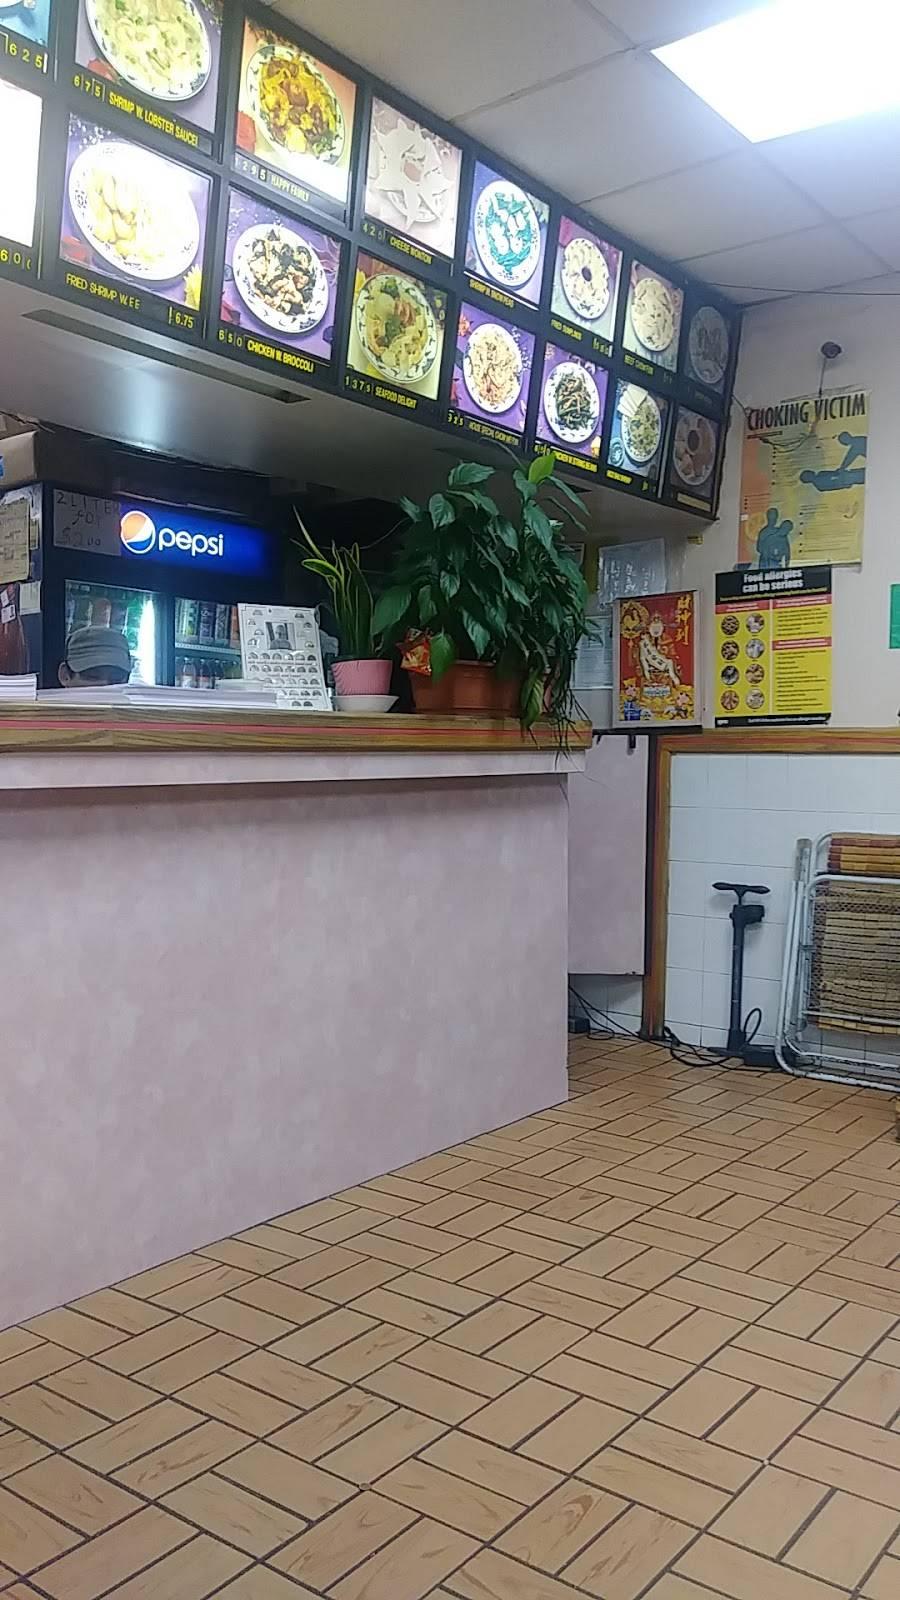 Peking Kitchen   restaurant   7106 Bay Pkwy, Brooklyn, NY 11204, USA   7182591297 OR +1 718-259-1297